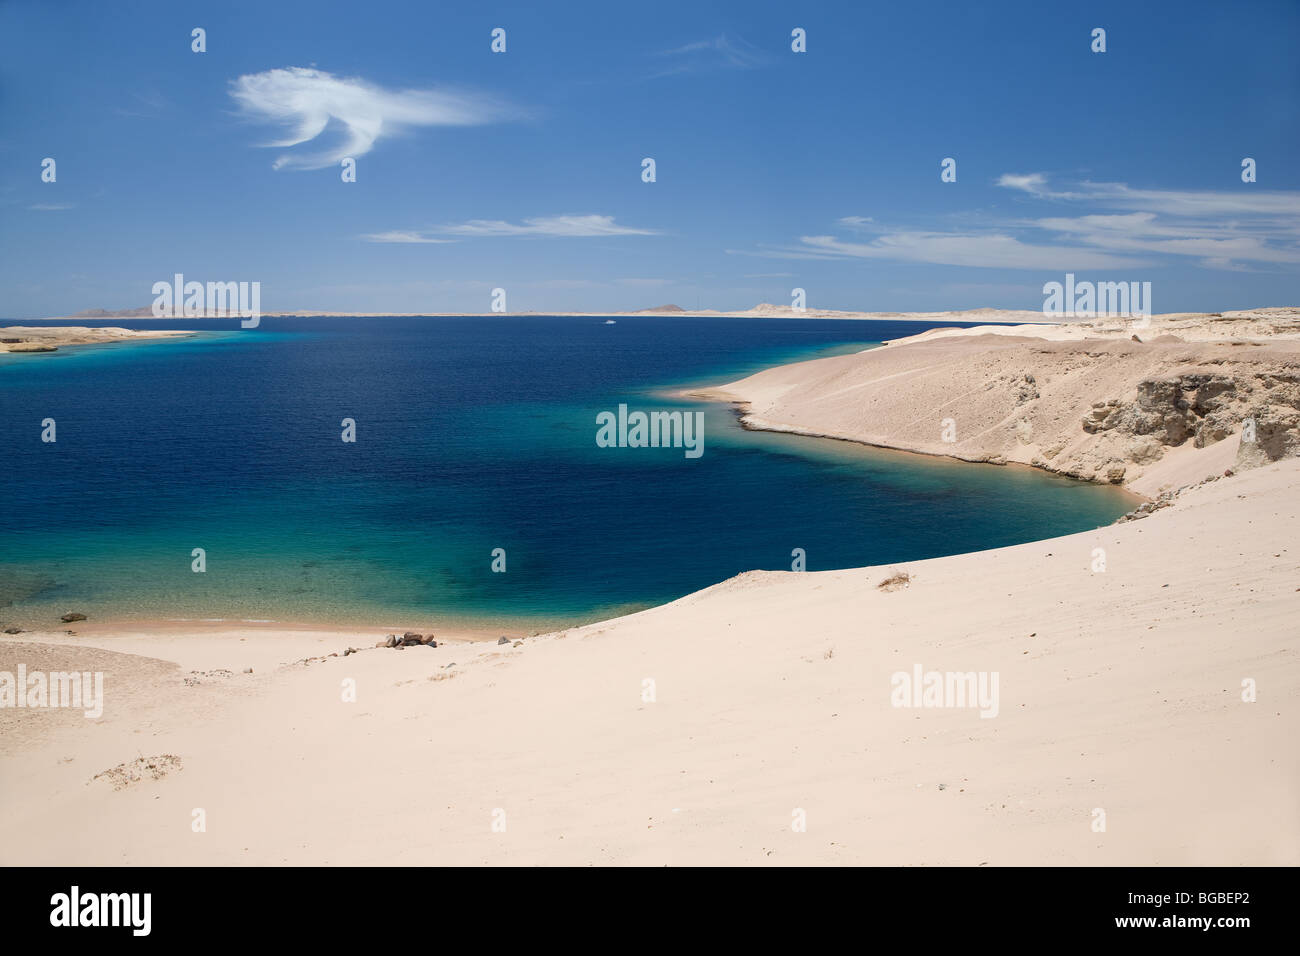 Africa, Egypt, Sharm el Sheikh, national park Ras Mohammed, beach, sea, water, blue, colors, sky - Stock Image